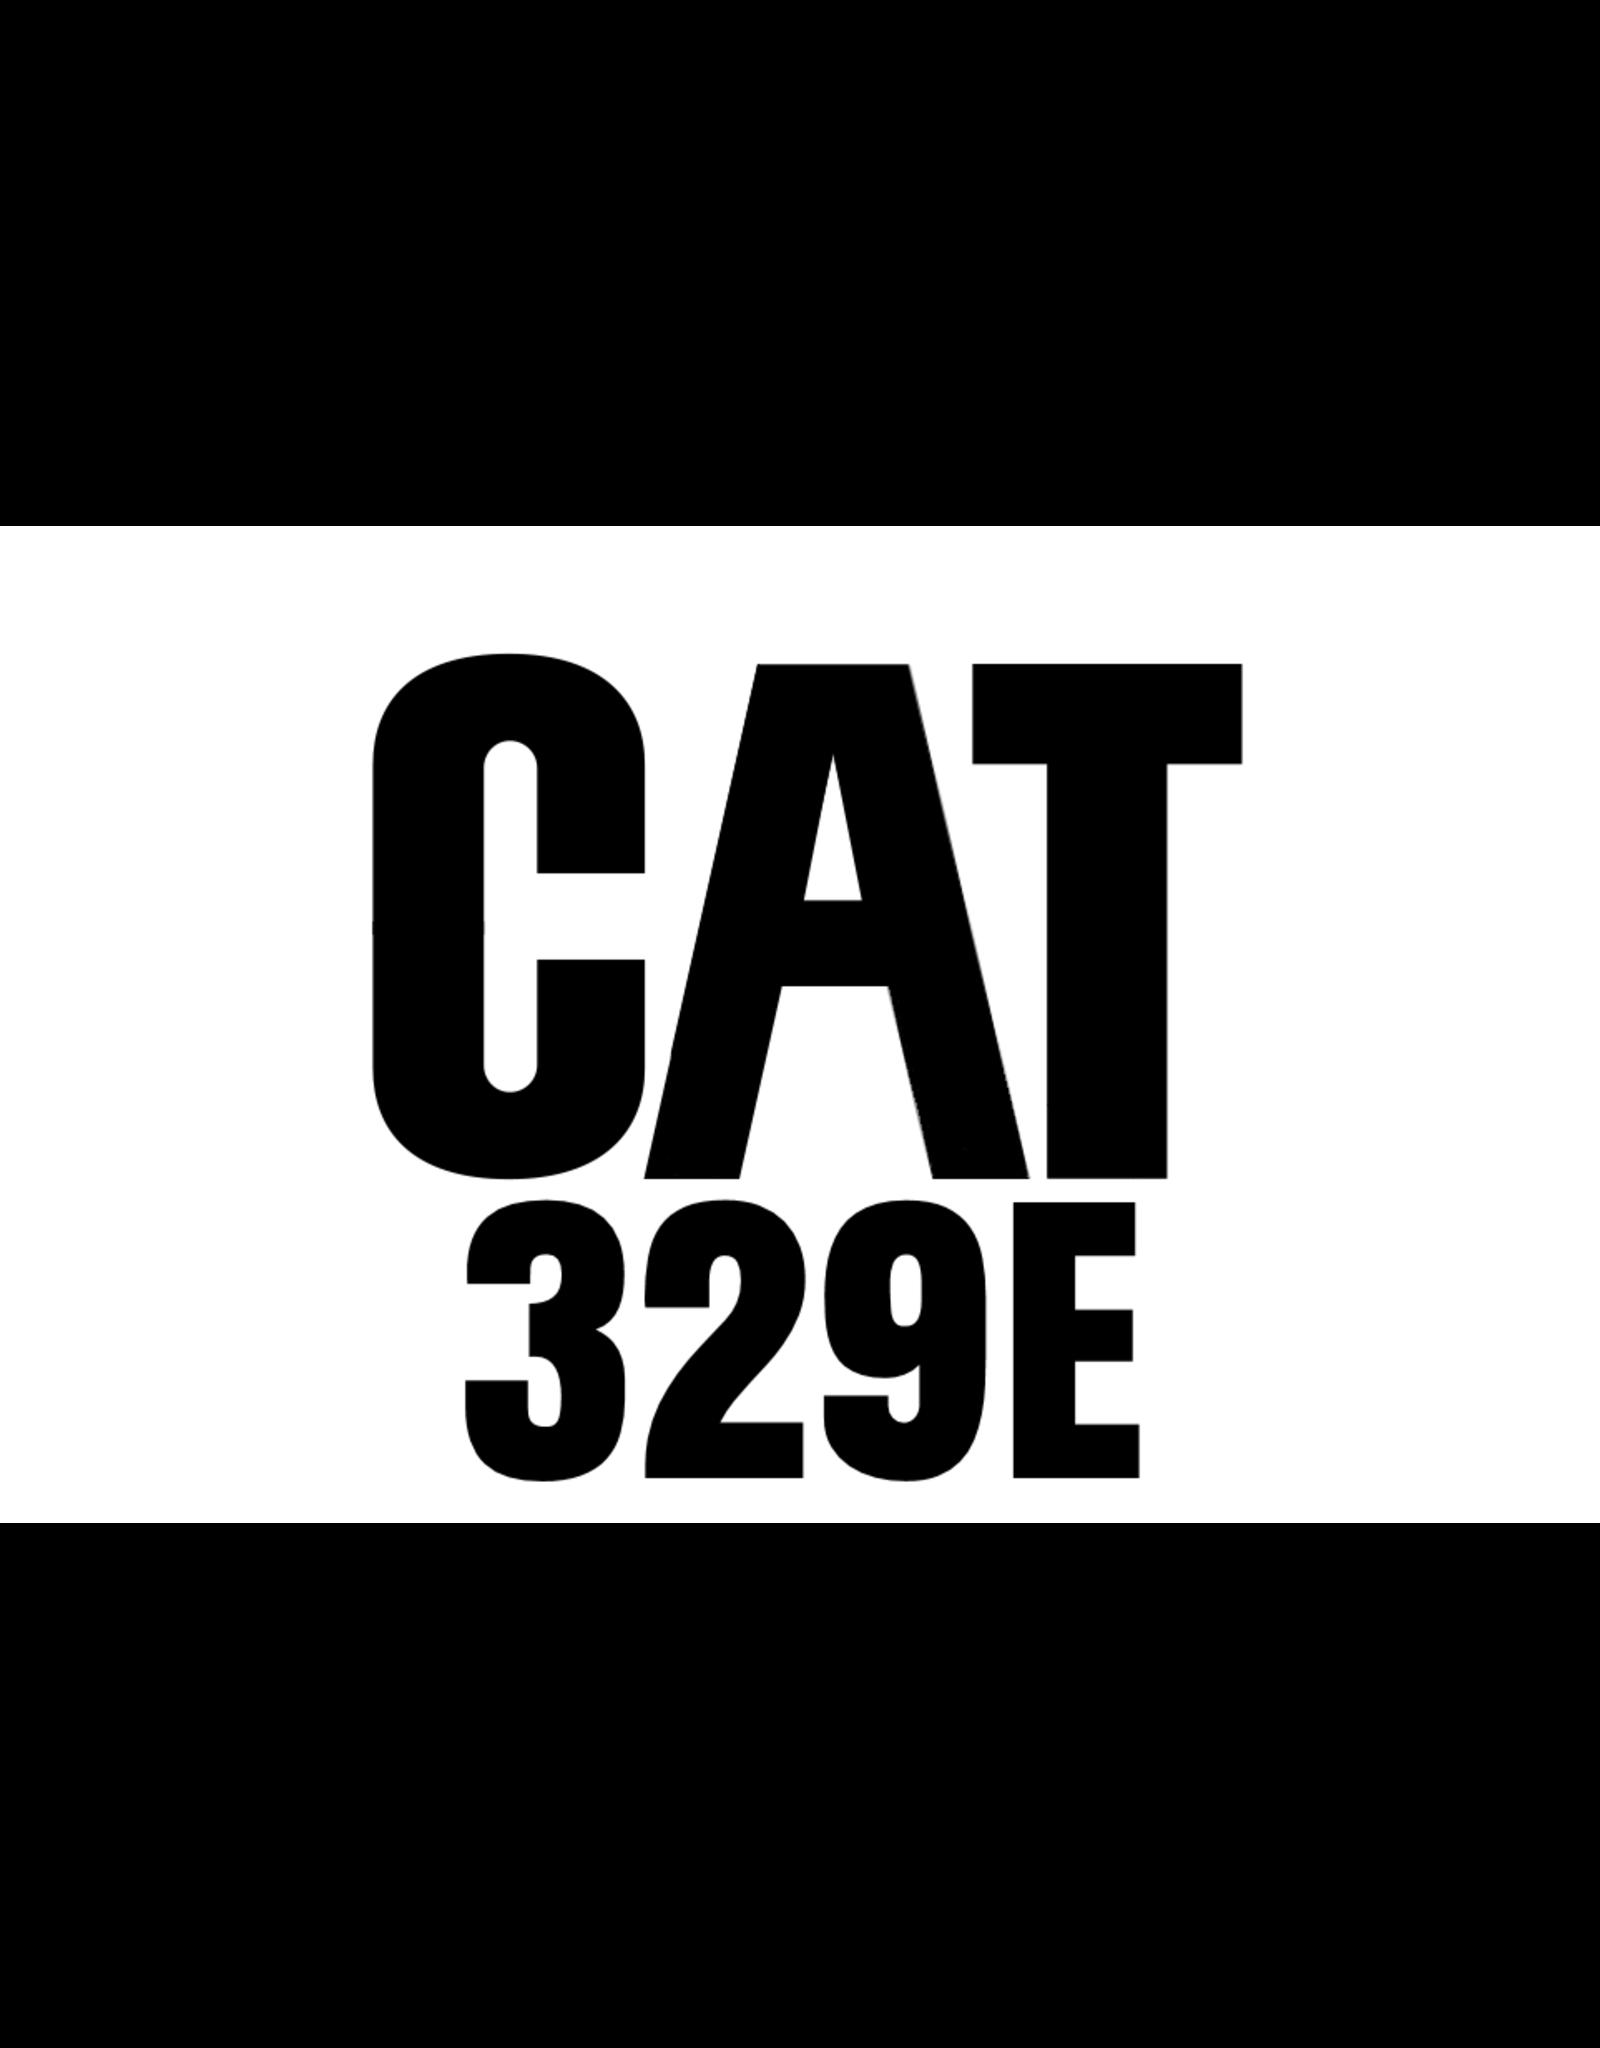 Echle Hartstahl GmbH FOPS für CAT 329E